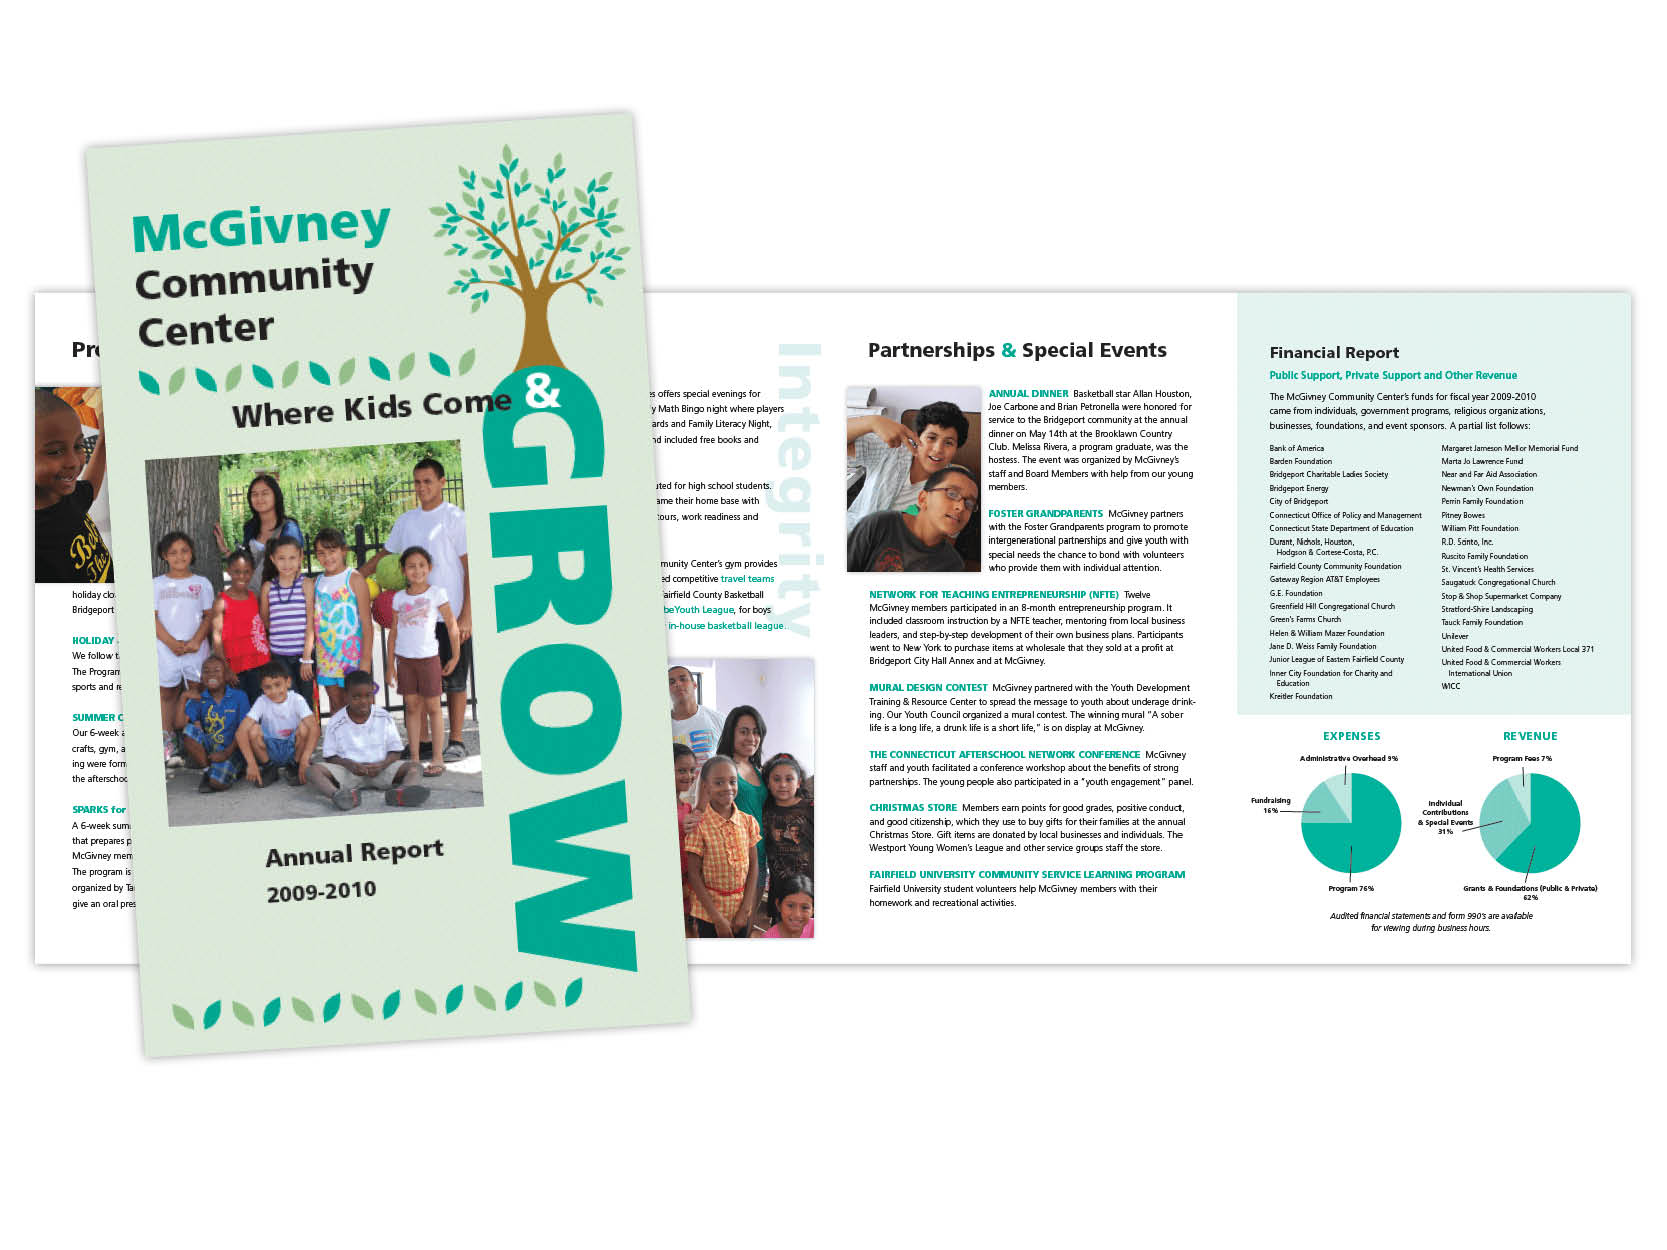 McGivney-annual-report-composite.jpg